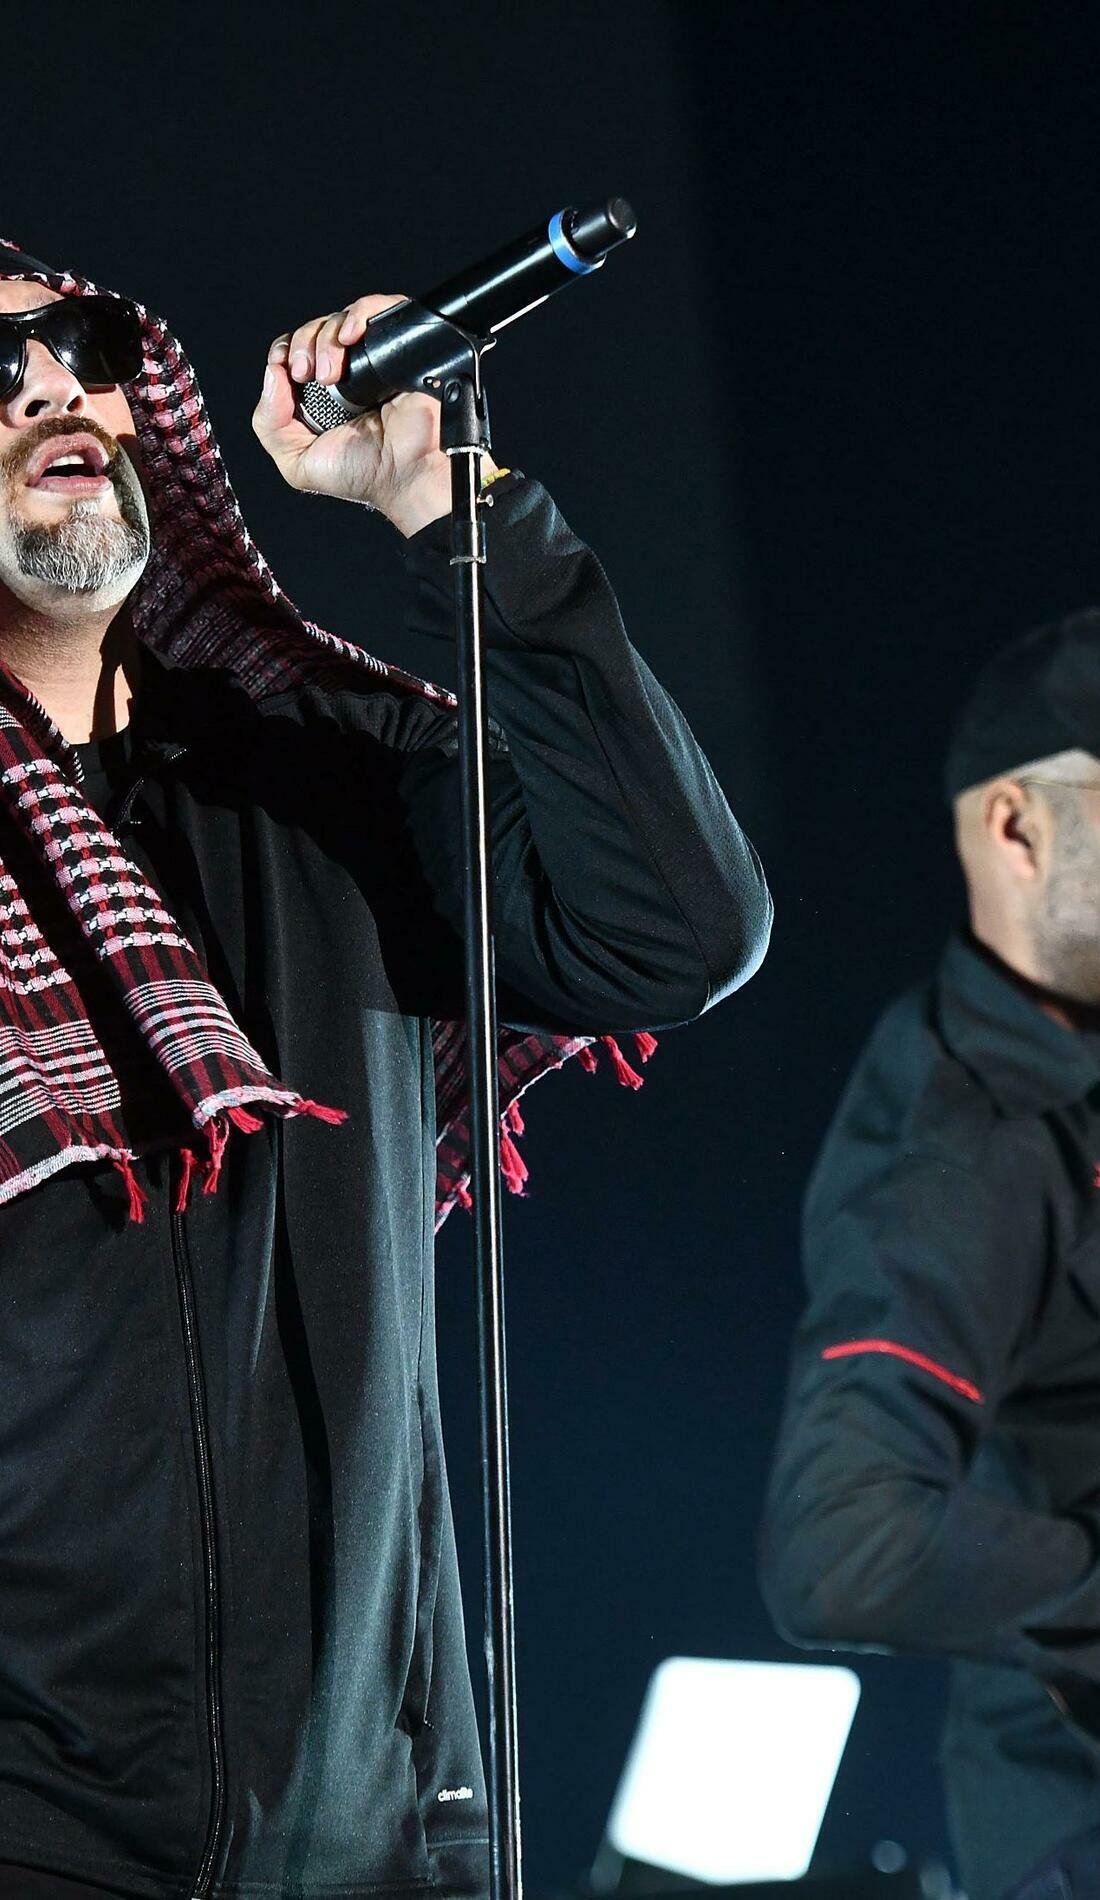 A Cypress Hill live event